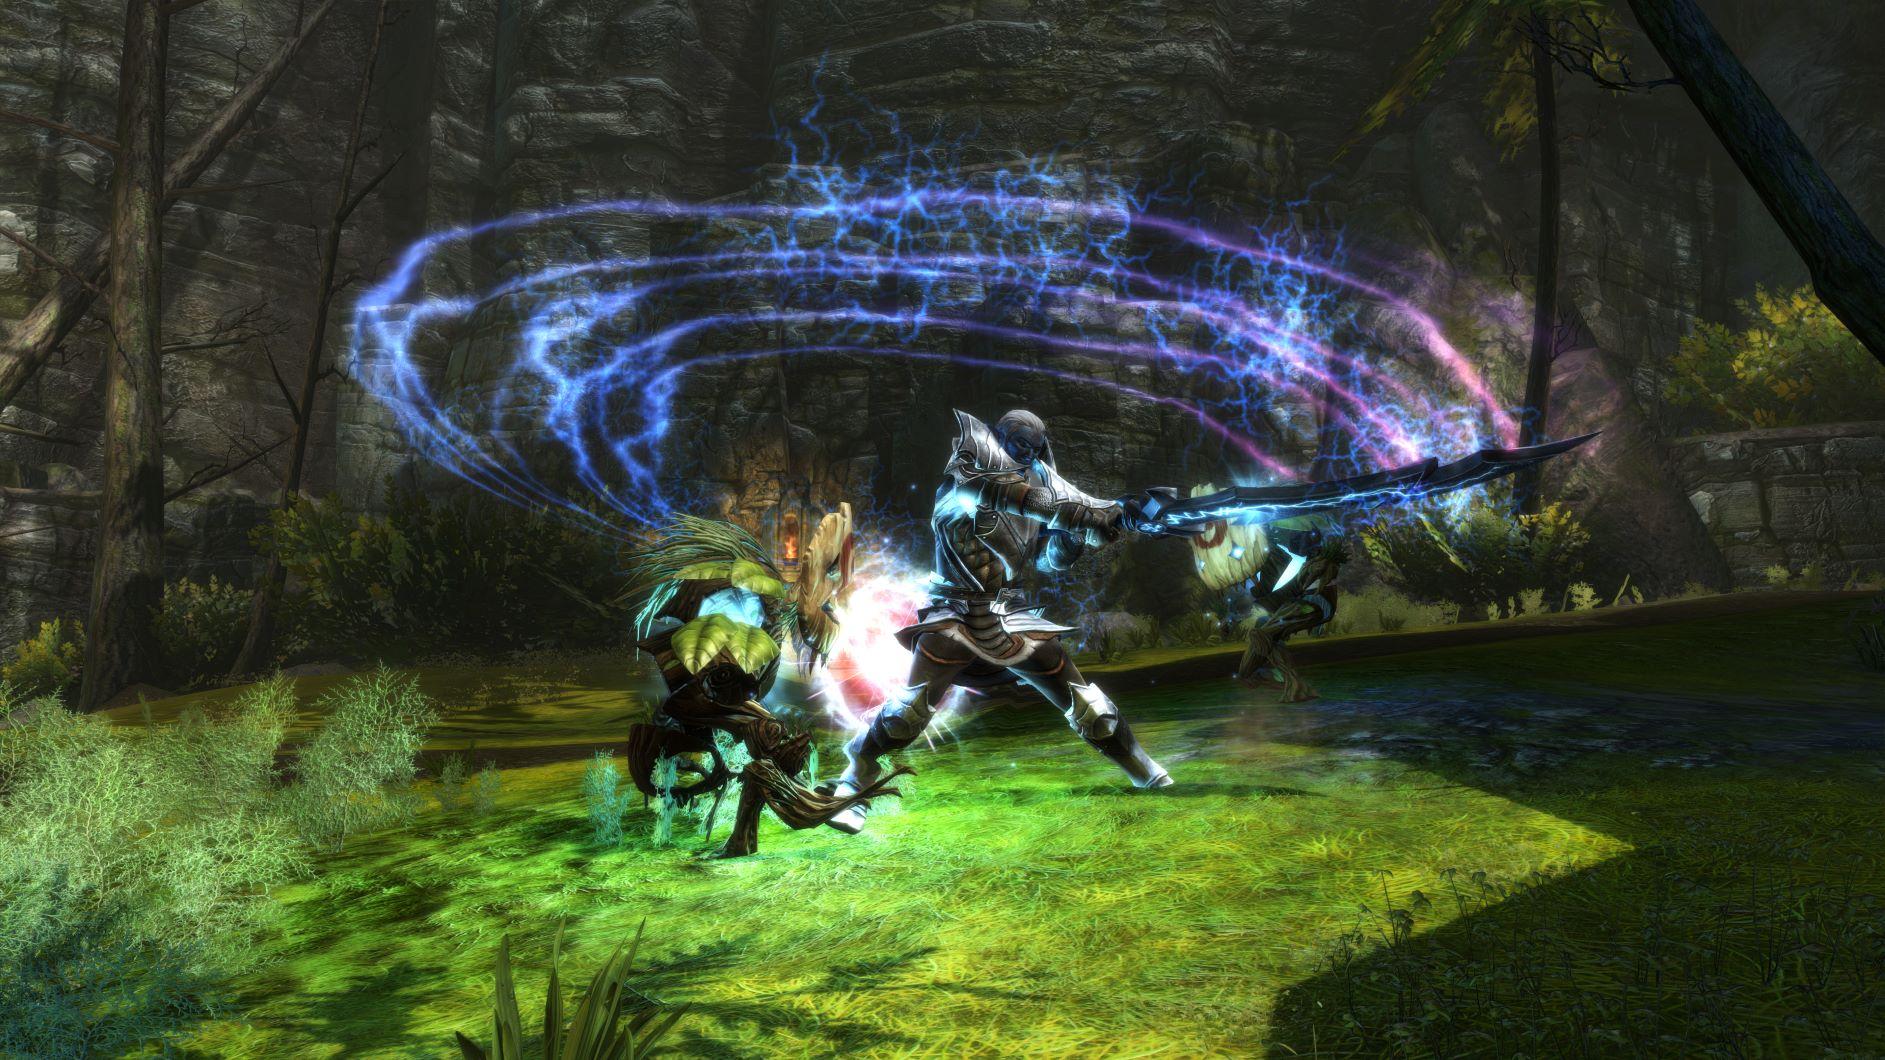 Kingdom of Amalur Re-Reckoning (Nintendo Switch)